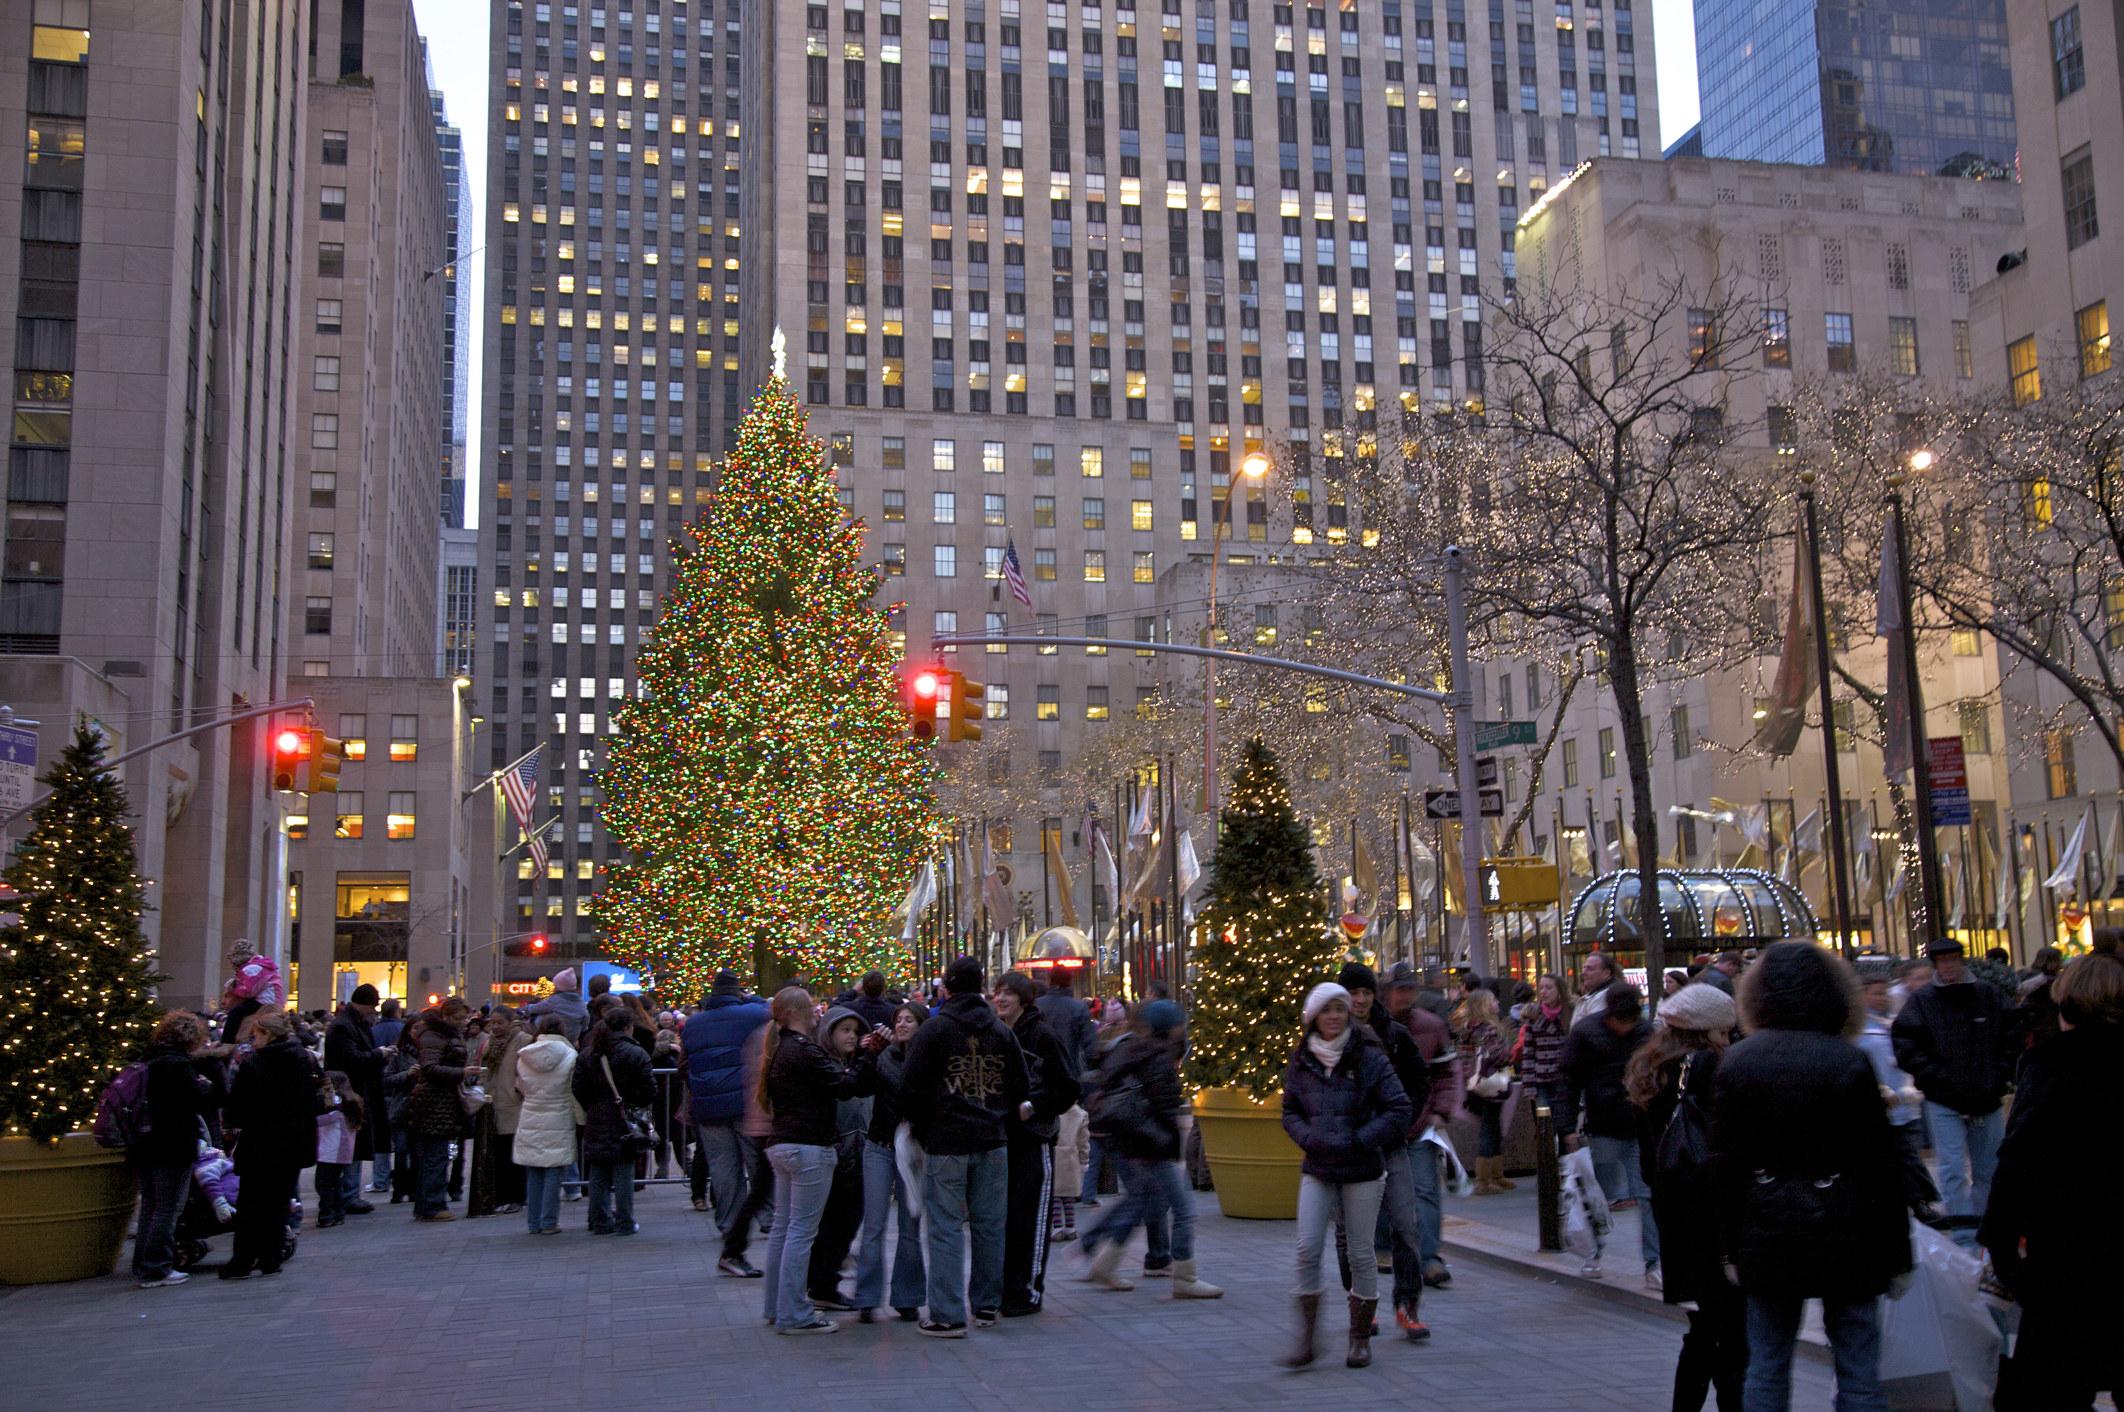 The Christmas tree lit up at Rockefeller Center